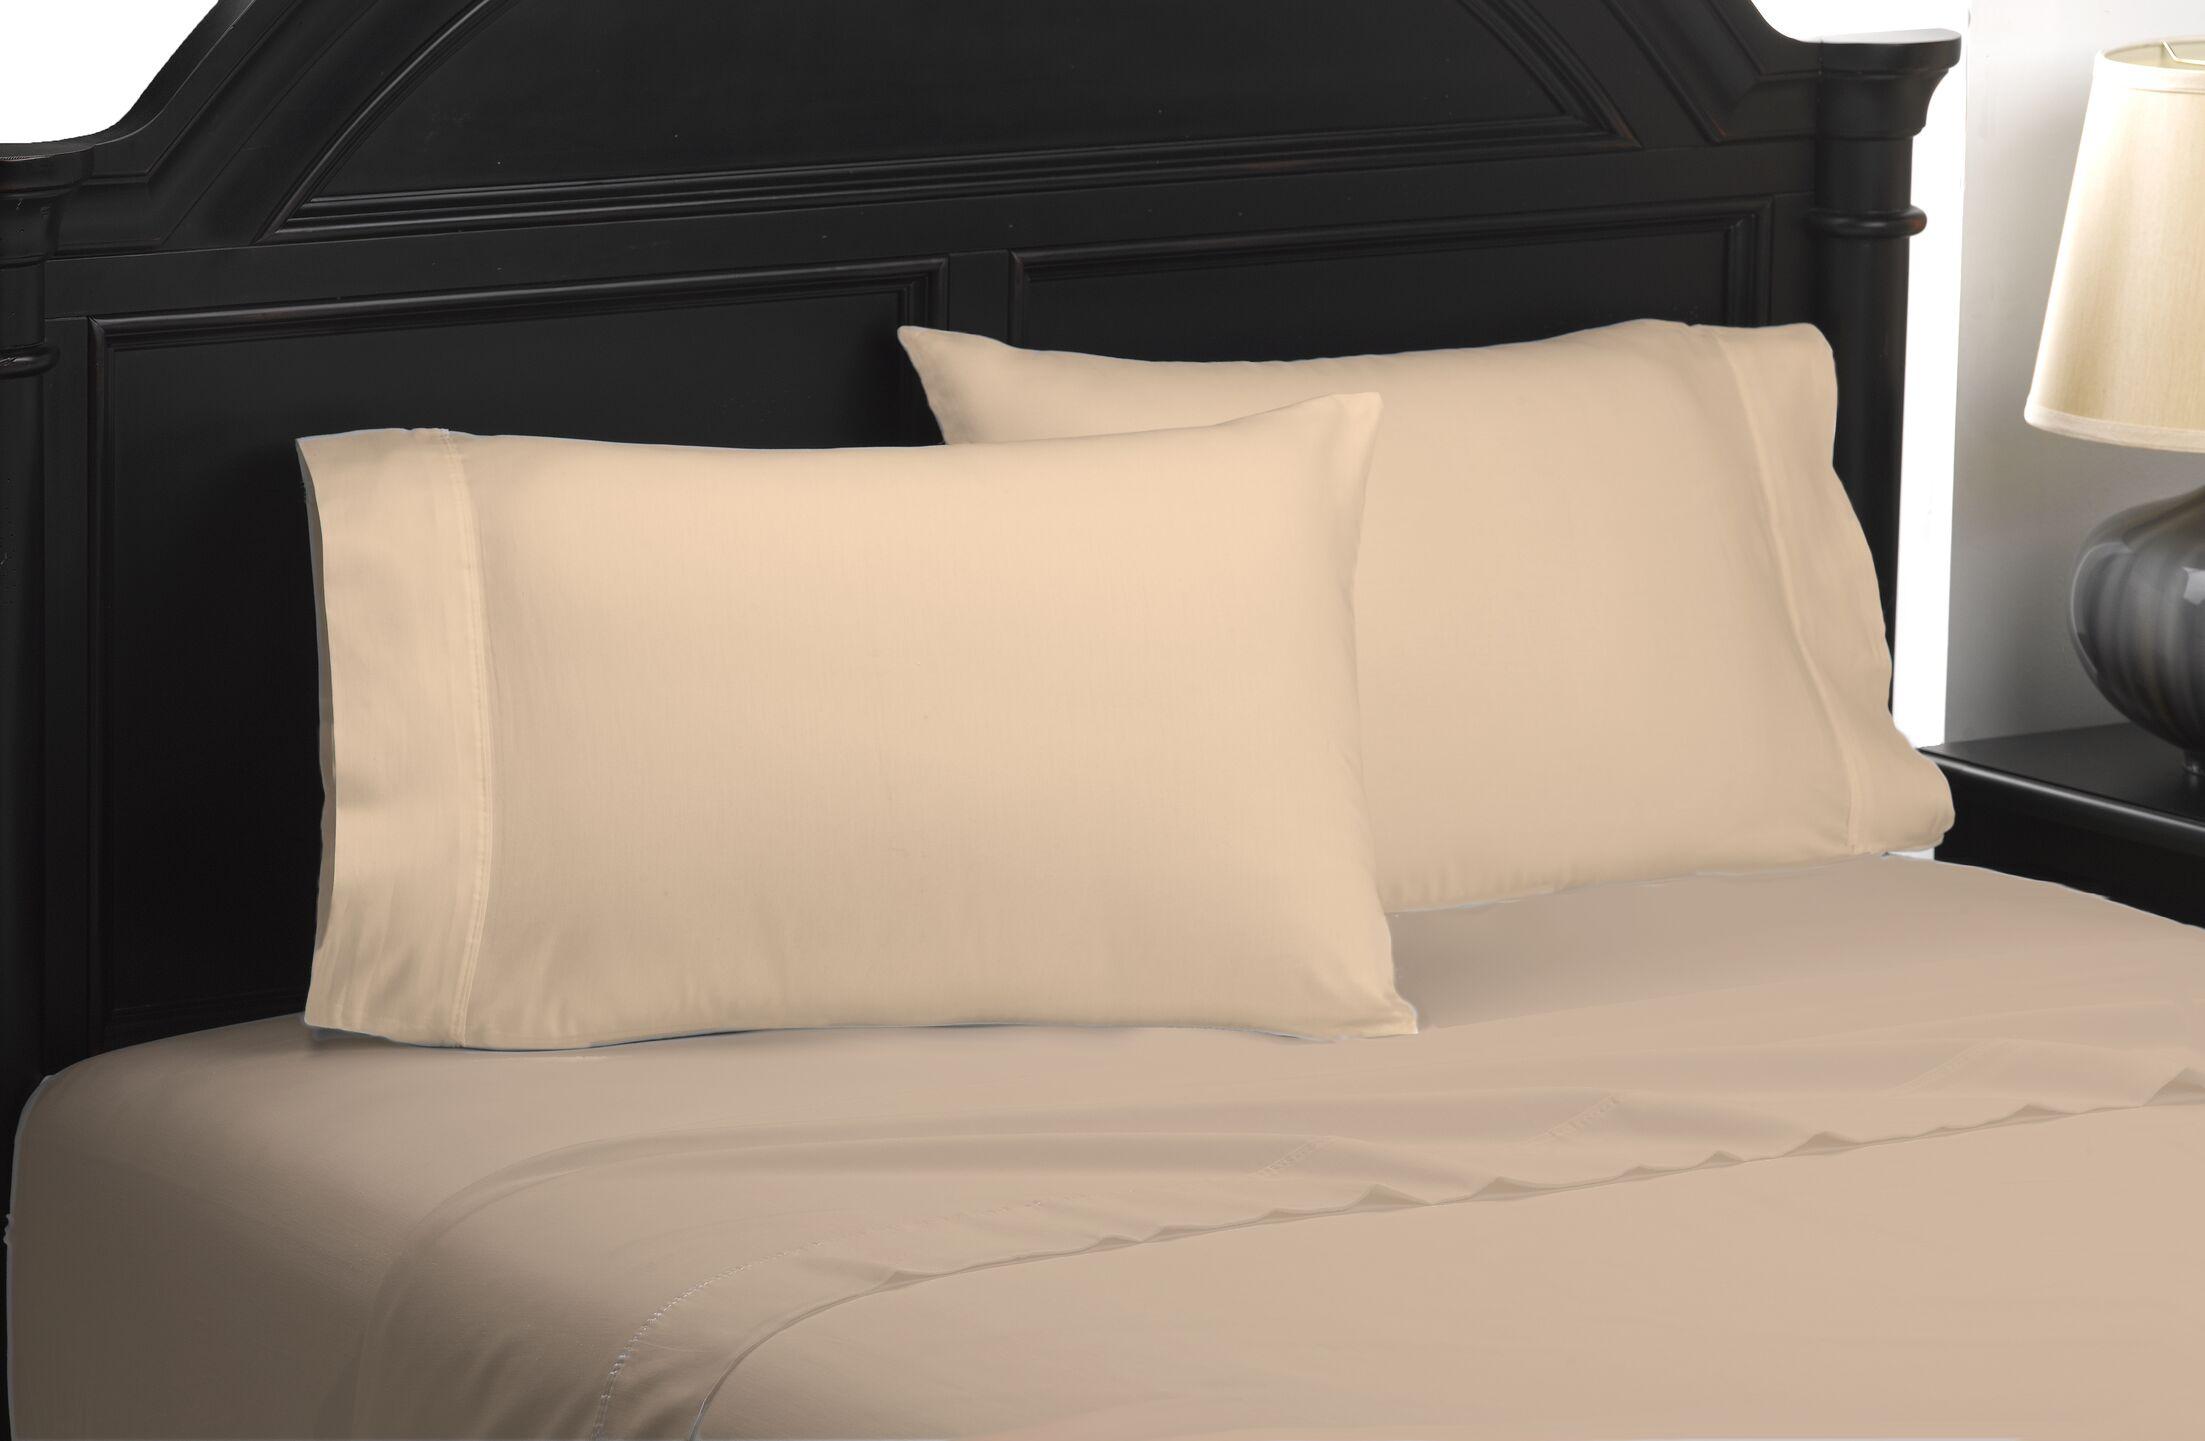 Exquisite Hotel 600 Thread Count 100% Cotton Sheet Set Size: Queen, Color: Bronze